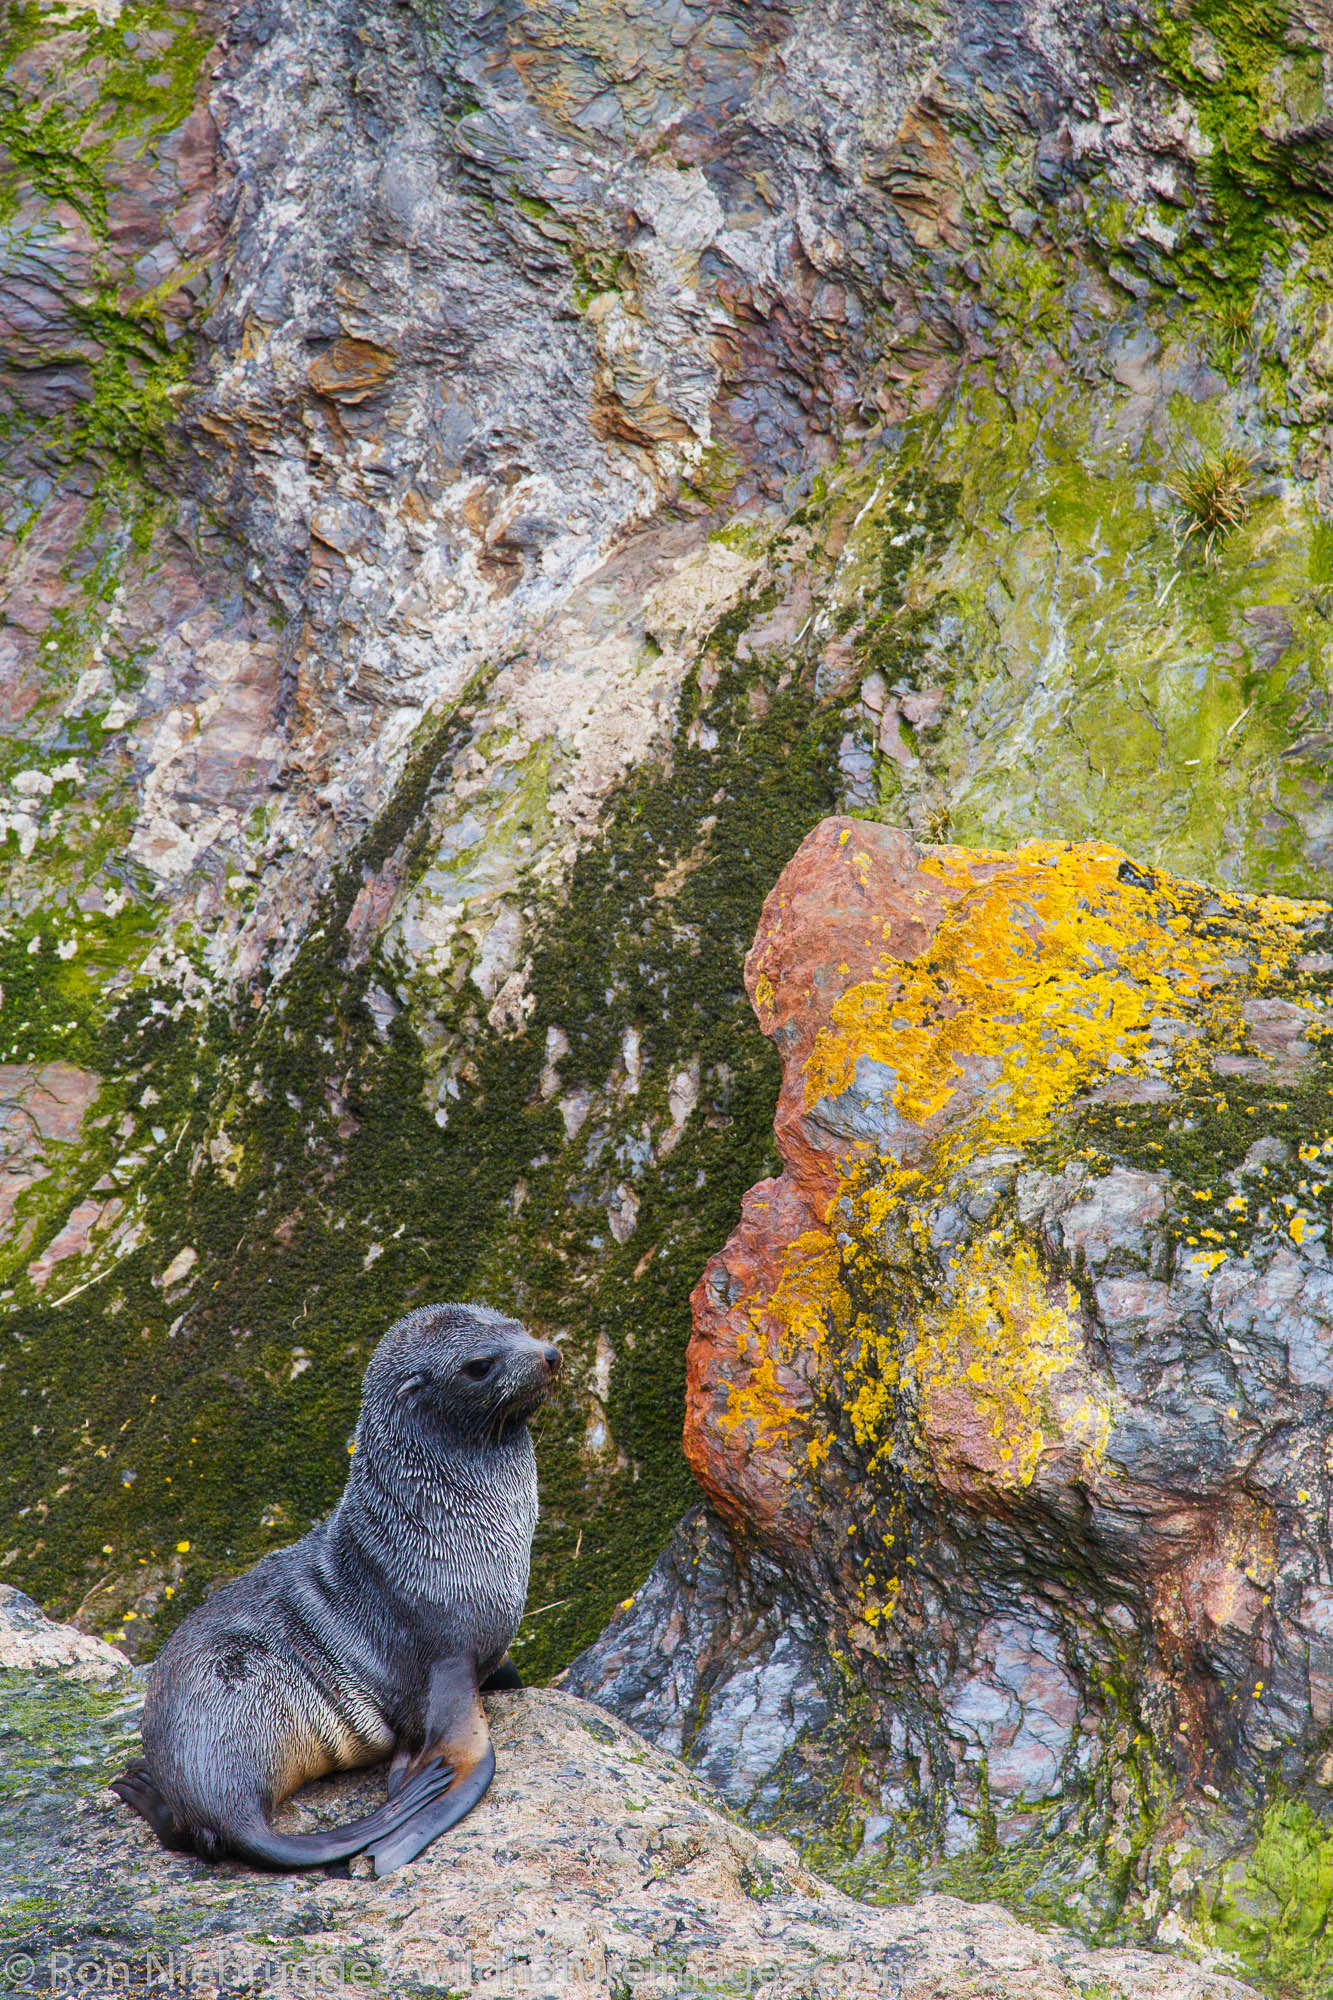 Antarctic fur seal (Arctocephalus gazella), Cooper Bay, South Georgia, Antarctica.